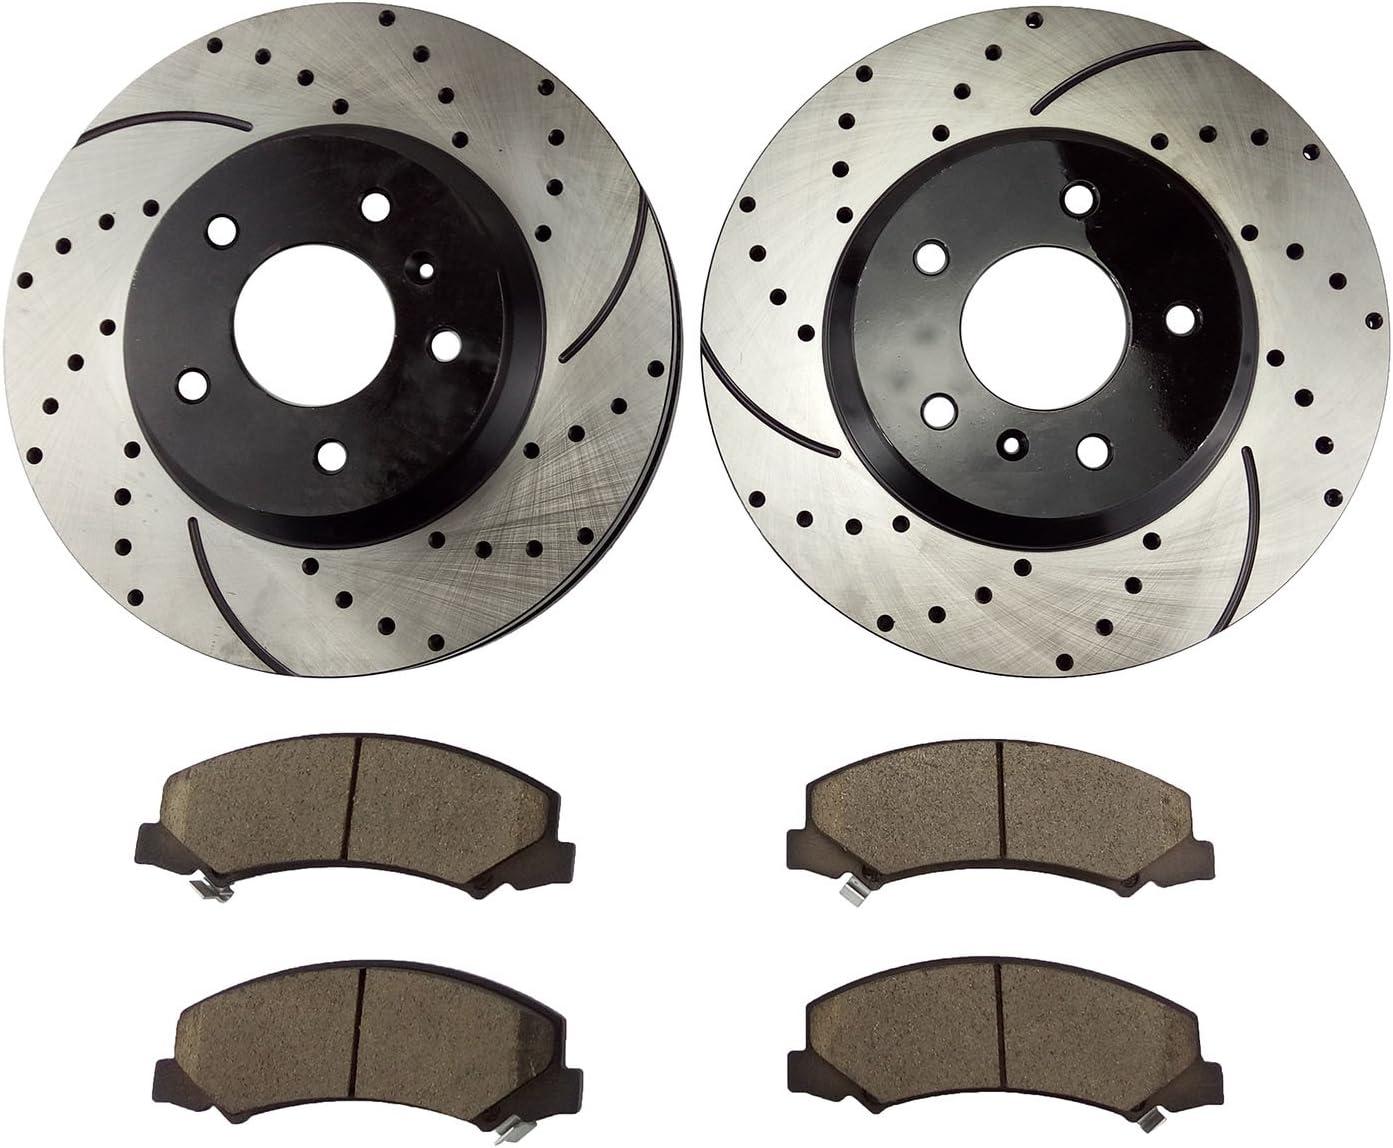 2006 2007 2008 2009 2010-14 Chevrolet Impala Front Brake Rotors Ceramic Pads